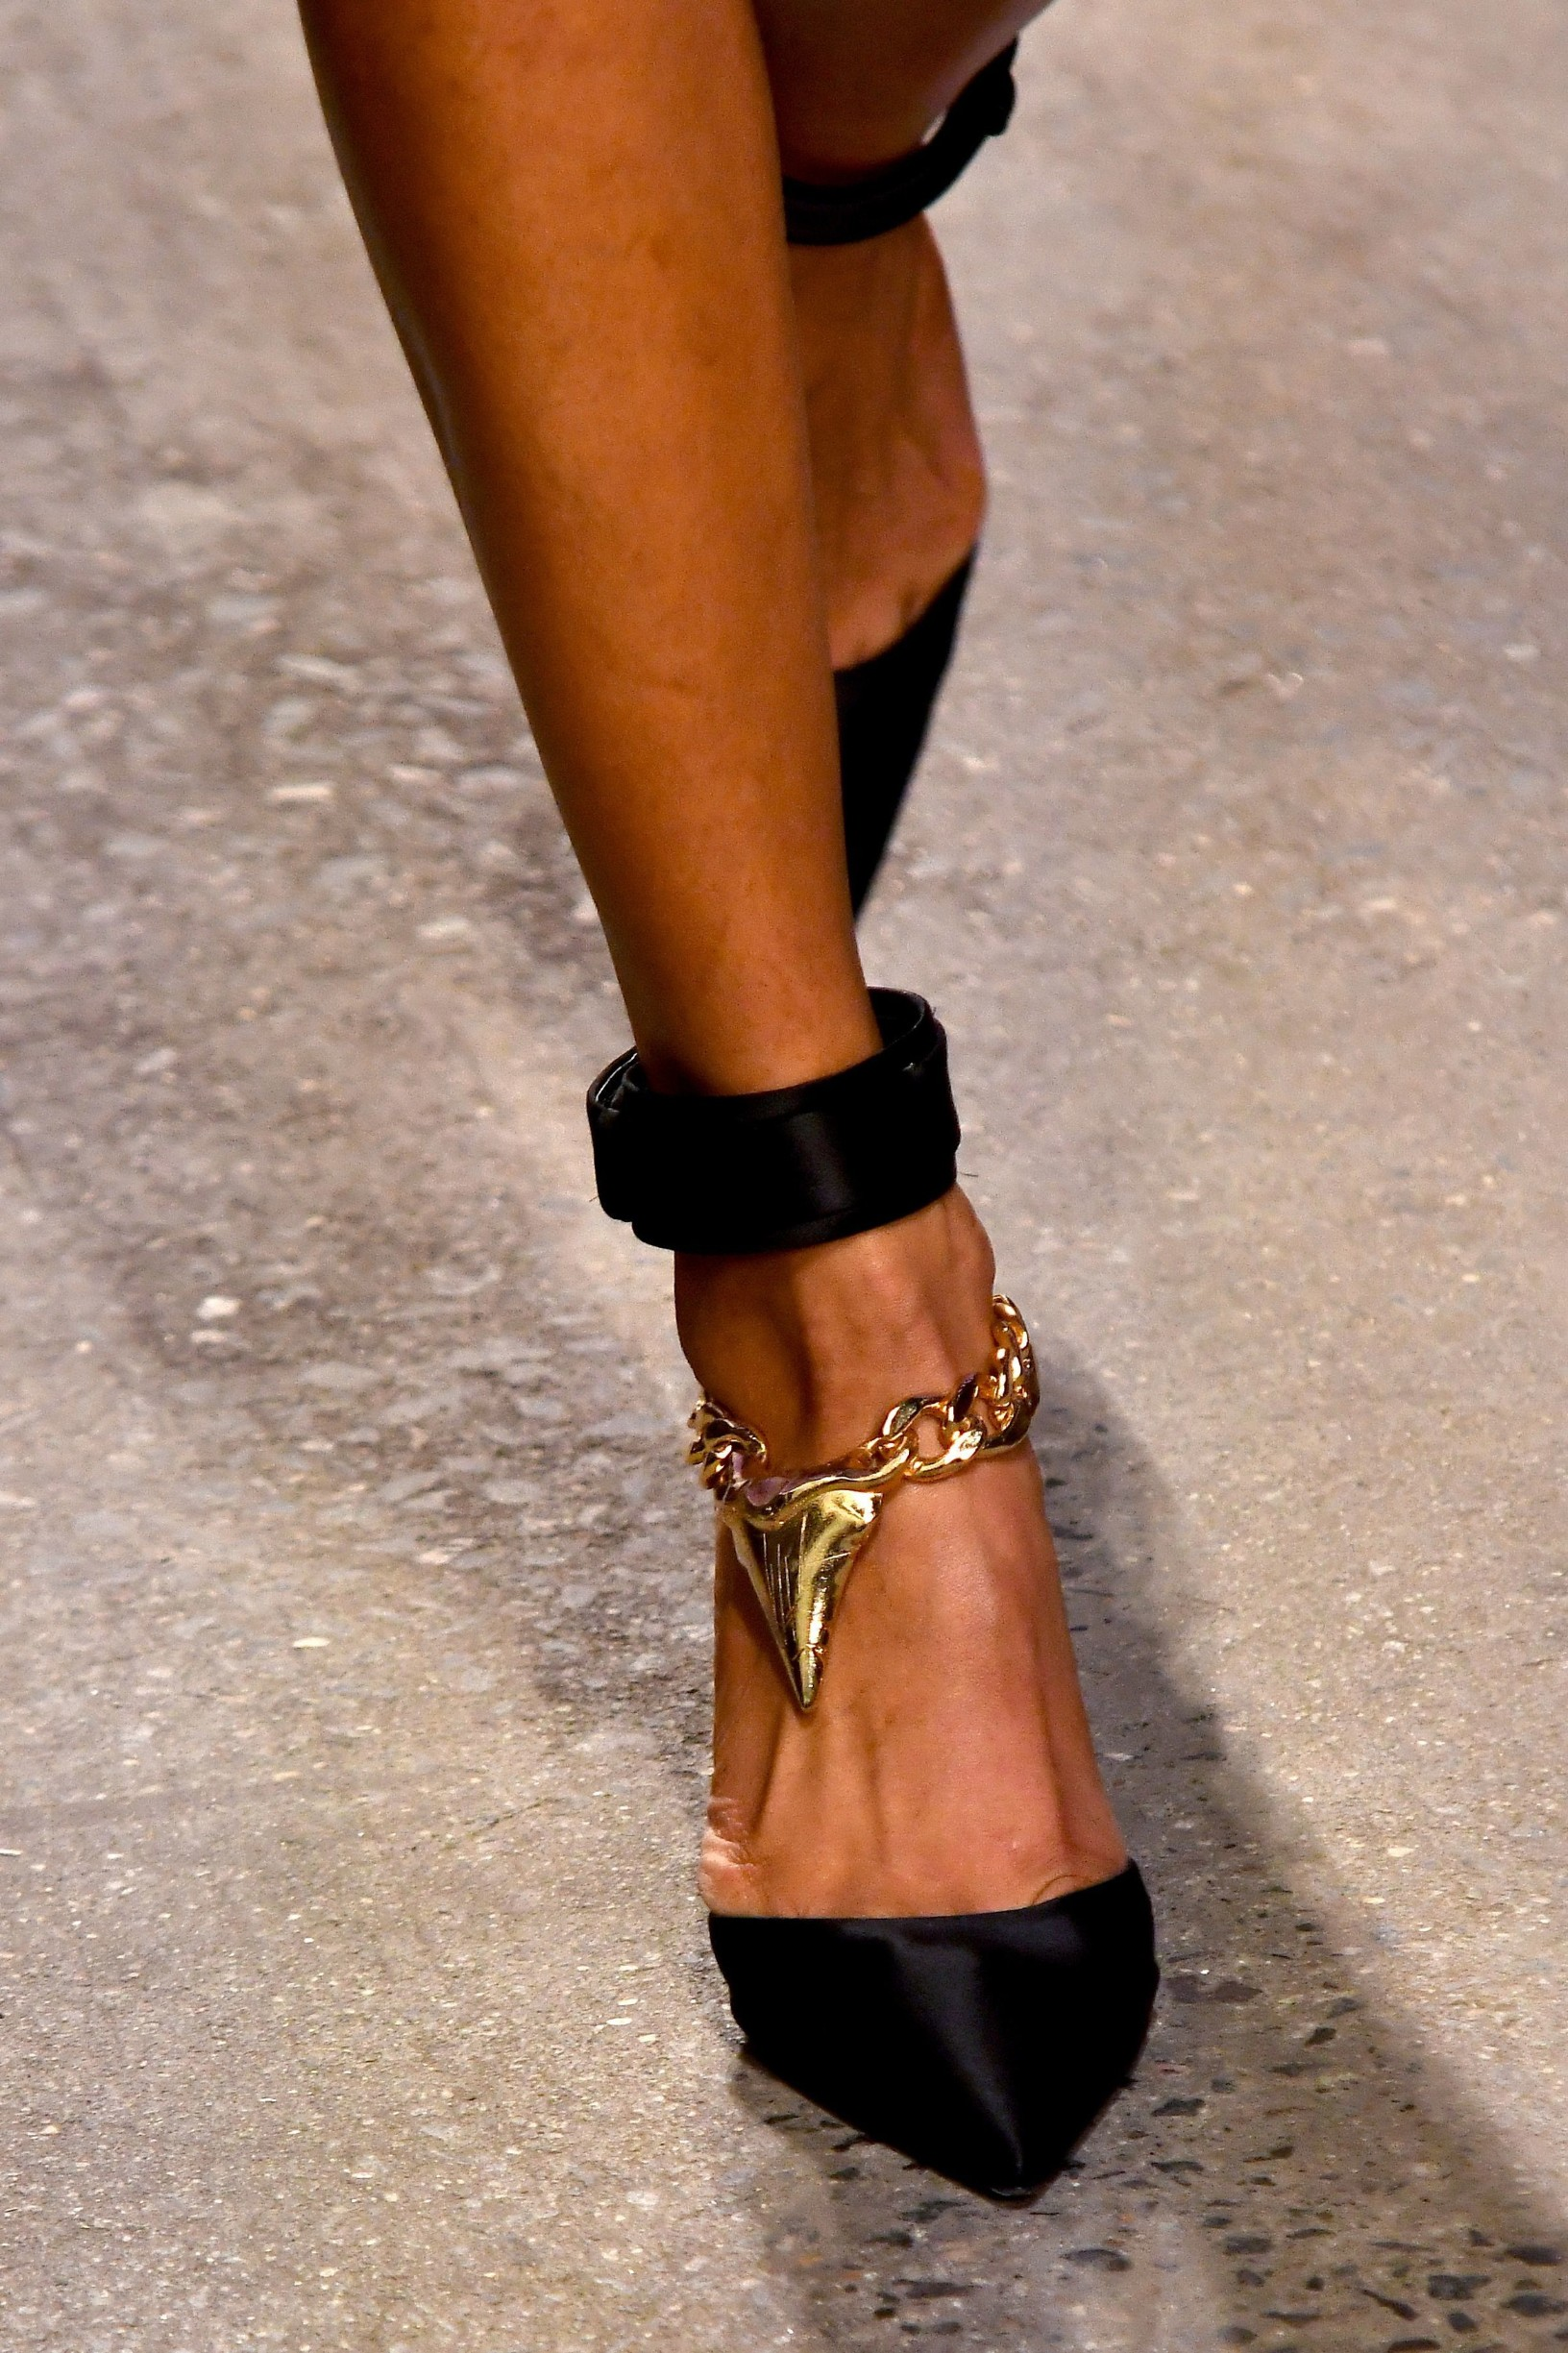 Model on catwalk, shoe detail Zimmermann show, Runway, Spring Summer 2020, New York Fashion Week, USA - 09 Sep 2019, Image: 469975283, License: Rights-managed, Restrictions: , Model Release: no, Credit line: WWD / Shutterstock Editorial / Profimedia